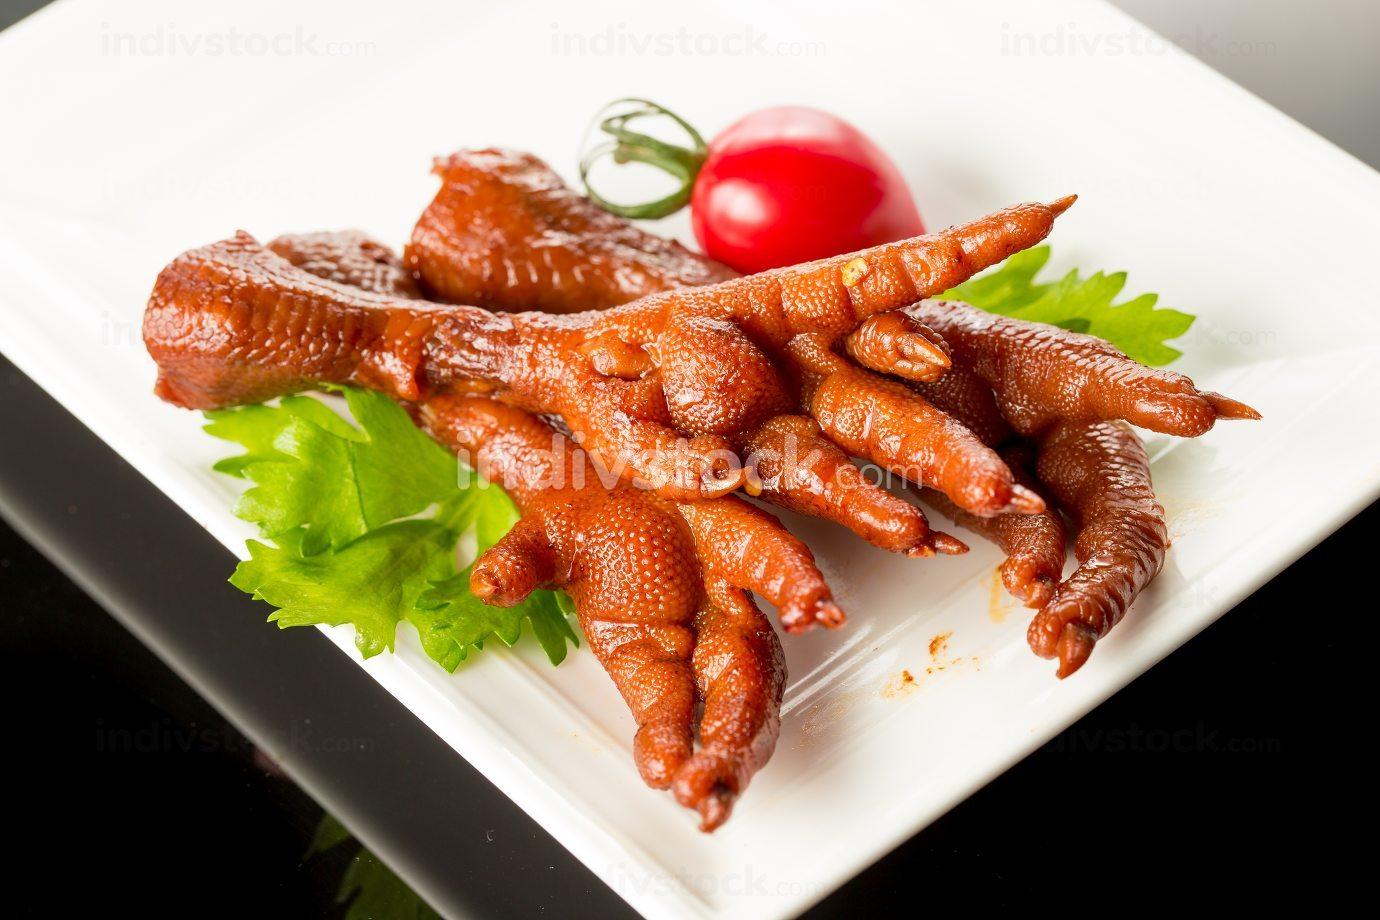 Braised Chicken claw, Chinese cuisine.